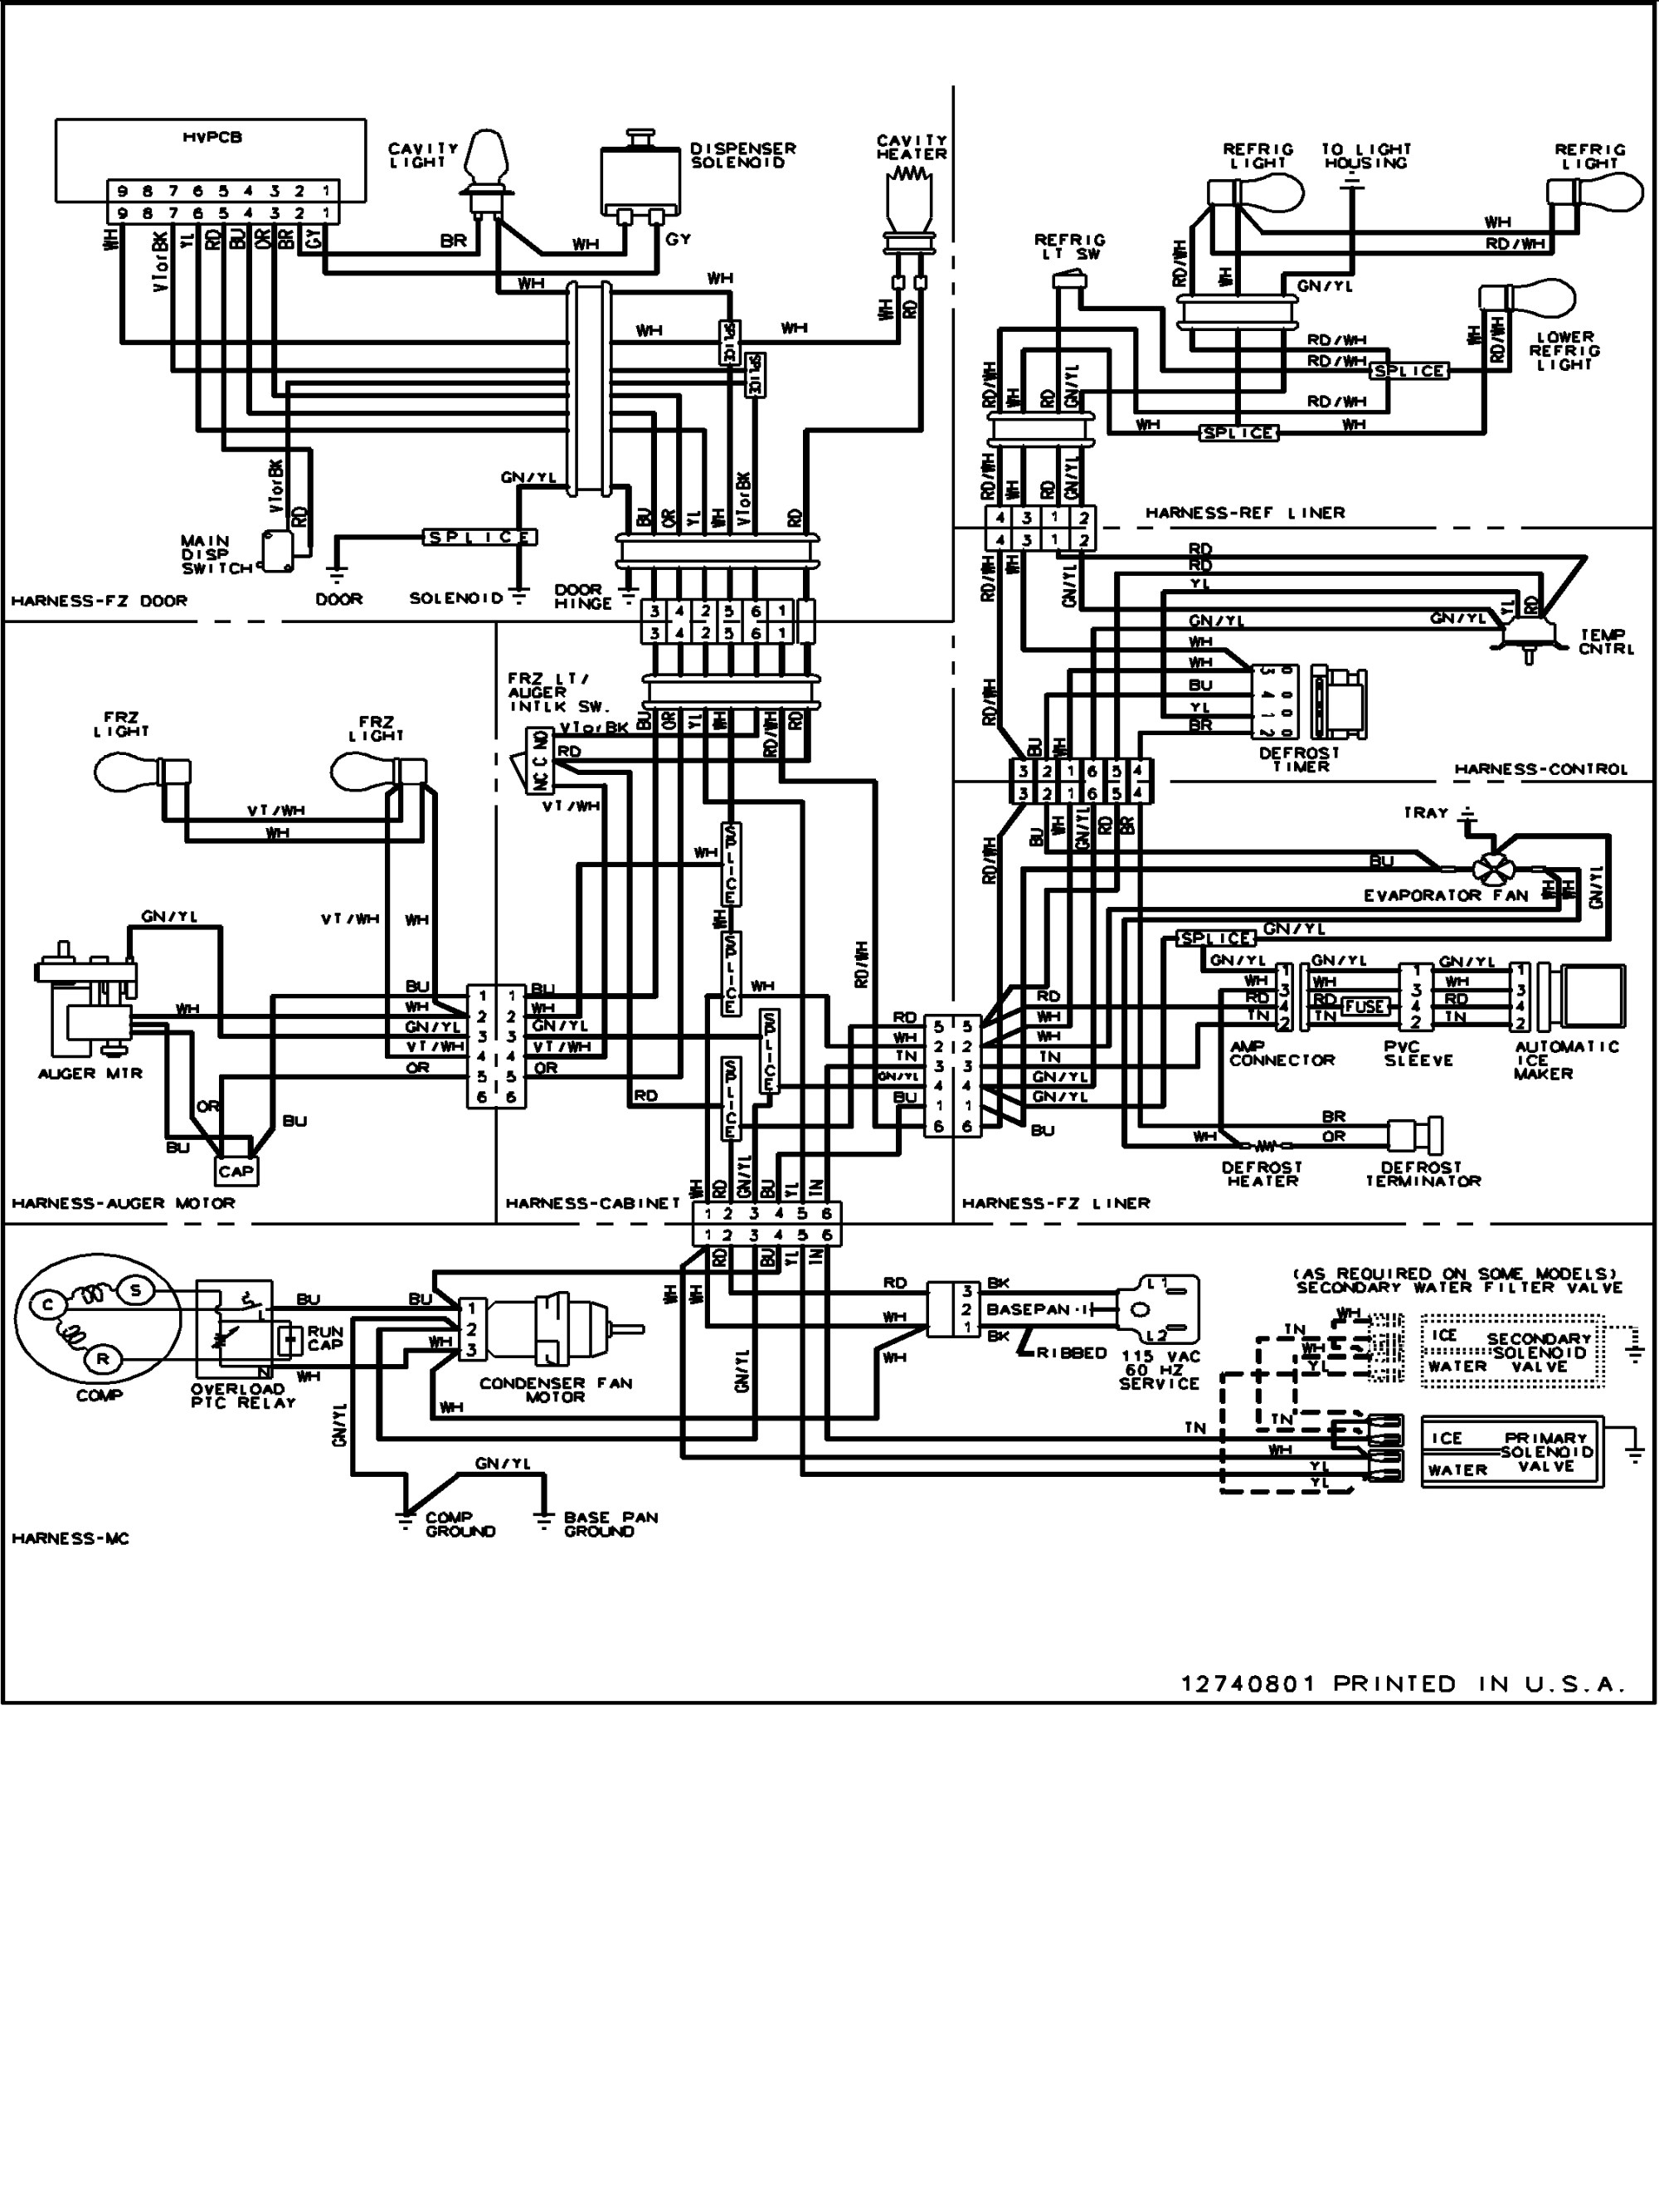 hight resolution of viking professional refrigerator wiring diagram wiring diagram split diagram refrigerator viking wiring vcsb483dbk